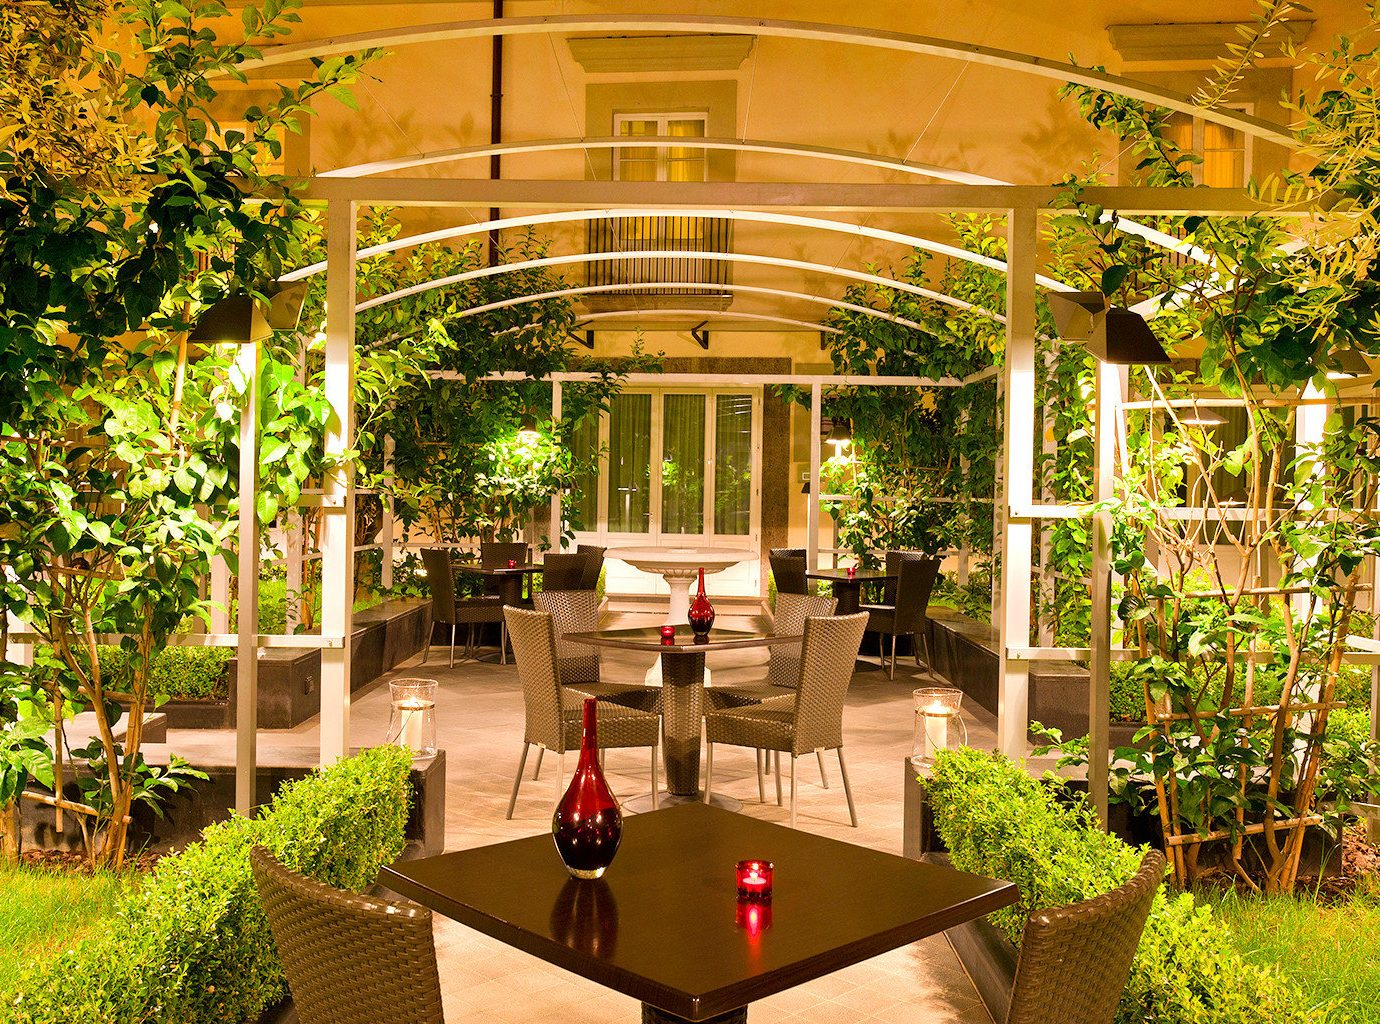 Design Hotels Lounge Modern Resort tree building Courtyard estate floristry Garden backyard plant outdoor structure home flower orangery plaza porch area furniture